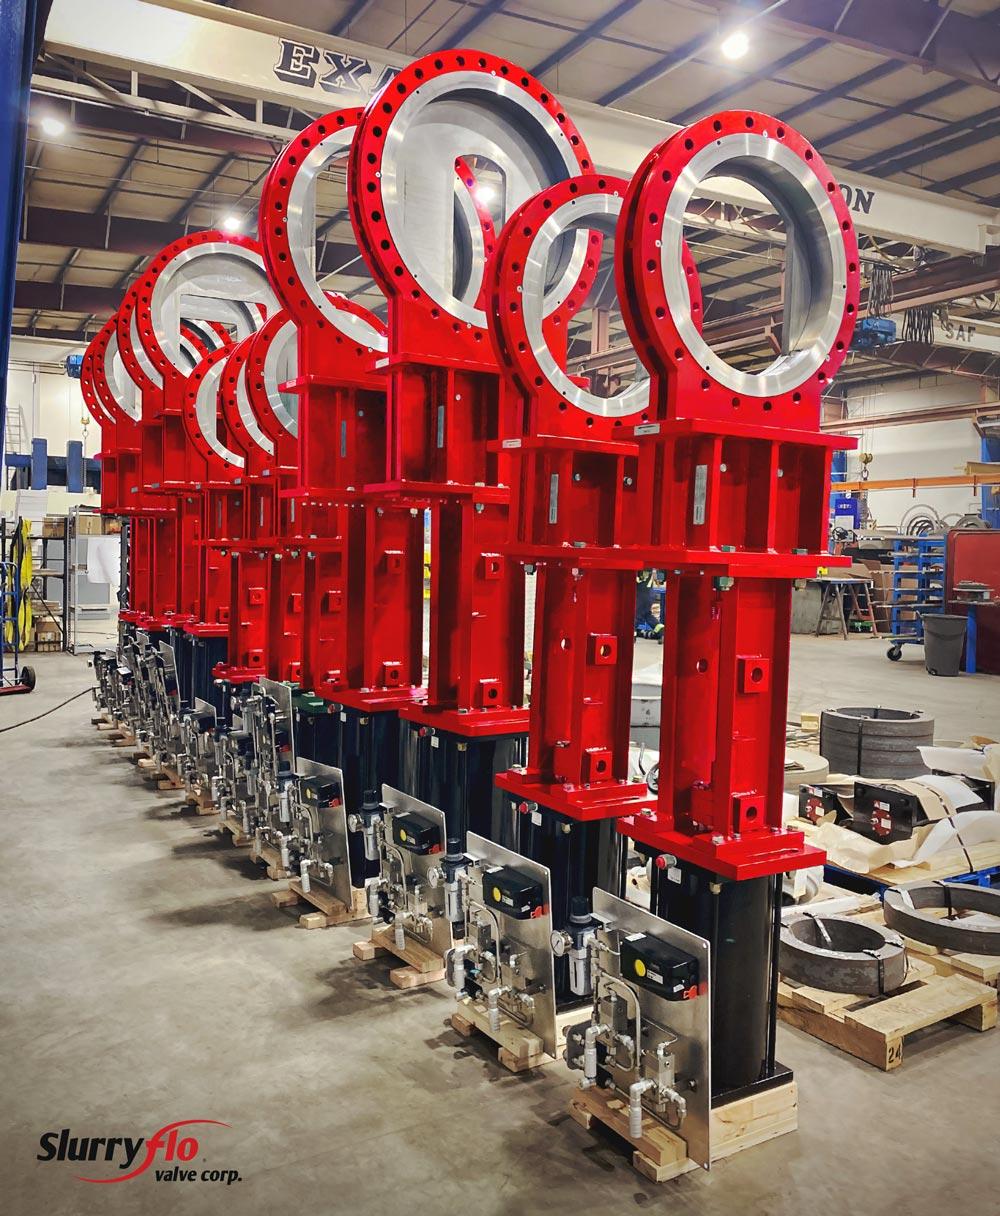 SlurryFlo control valves ready for severe service applications